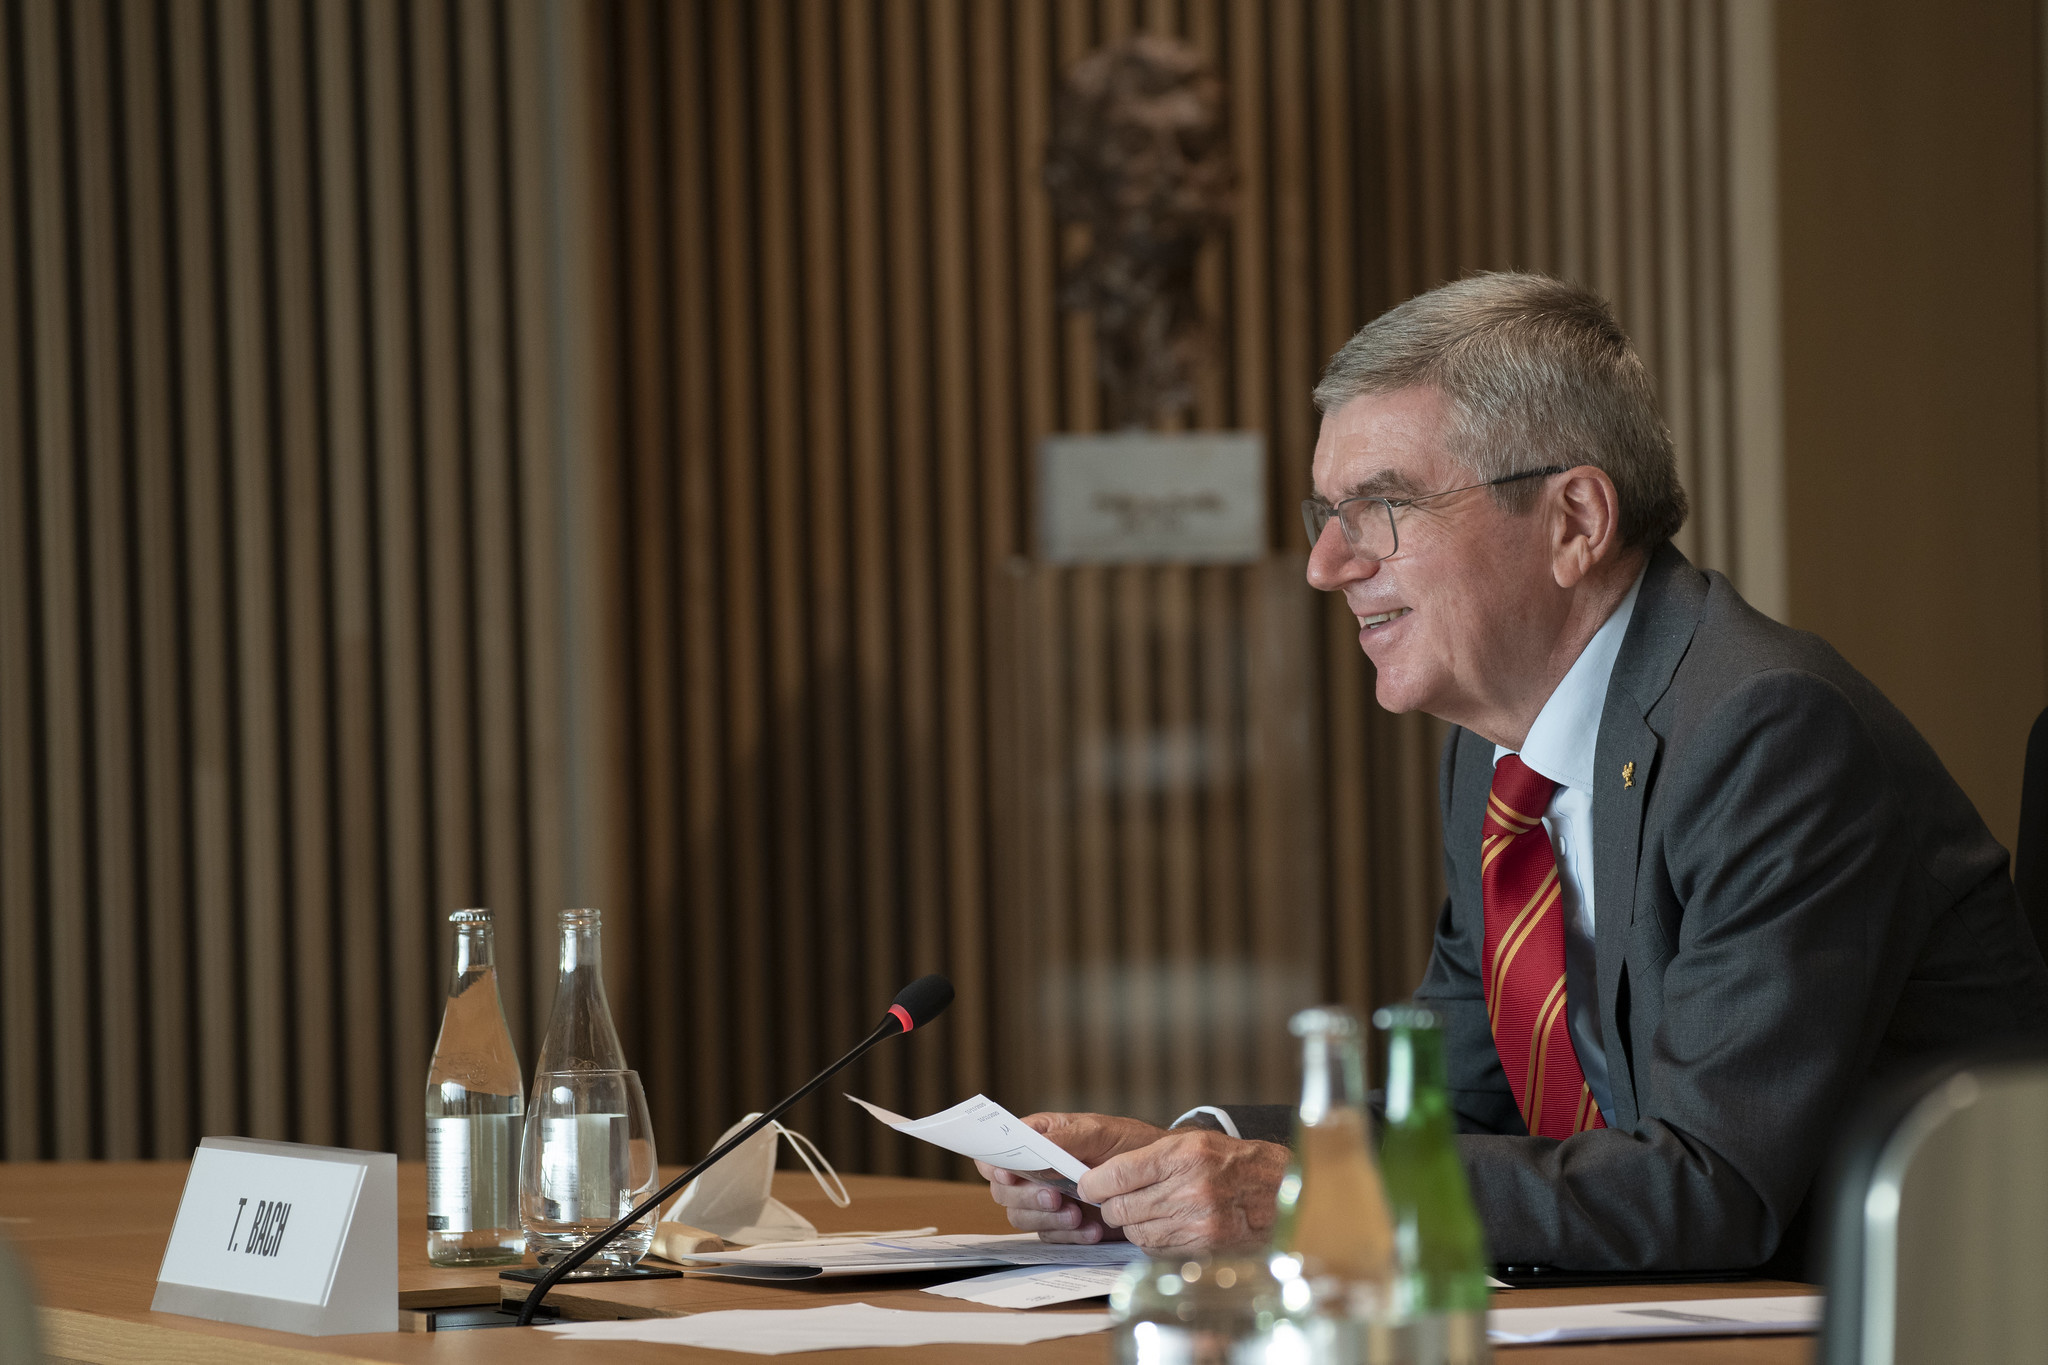 IOC President Thomas Bach will visit Tokyo next week ©IOC